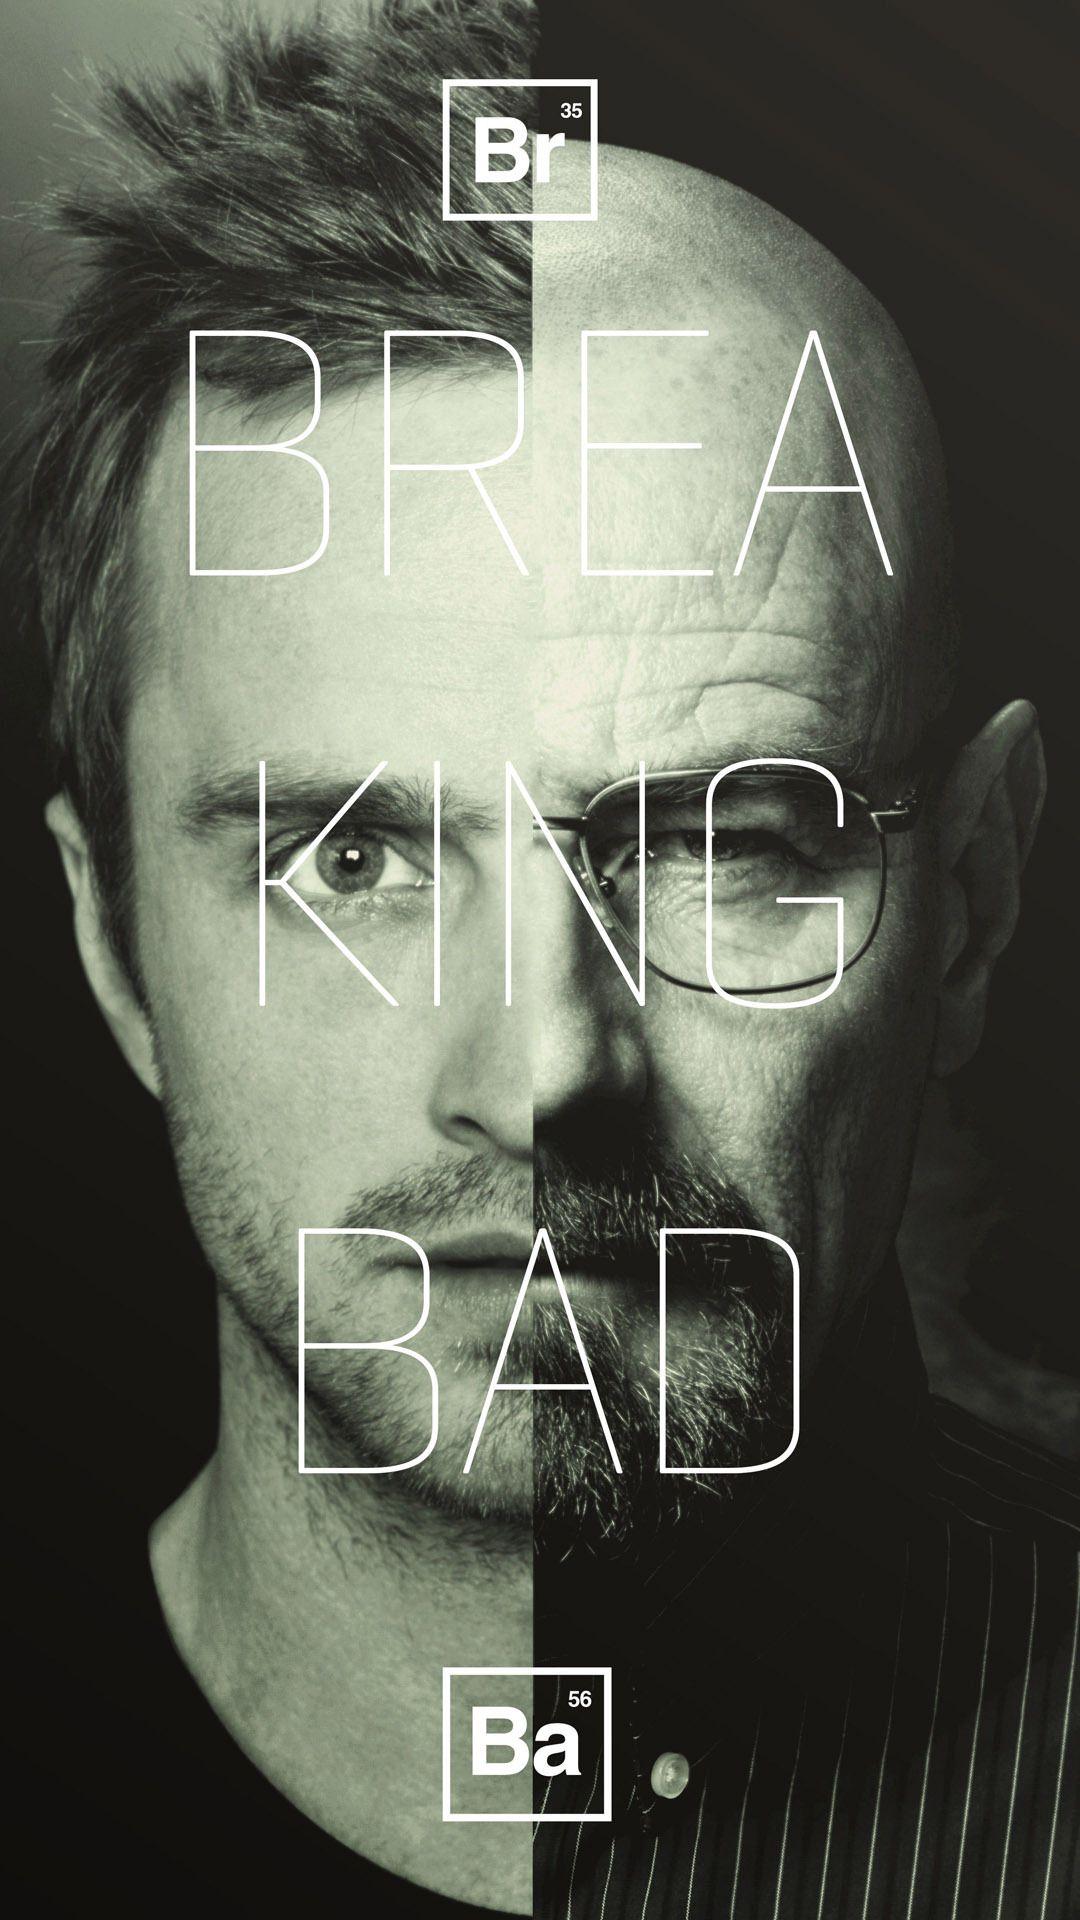 Breaking Bad Background For Iphone Download Free Full Hd Breaking Bad 1080x1920 Download Hd Wallpaper Wallpapertip